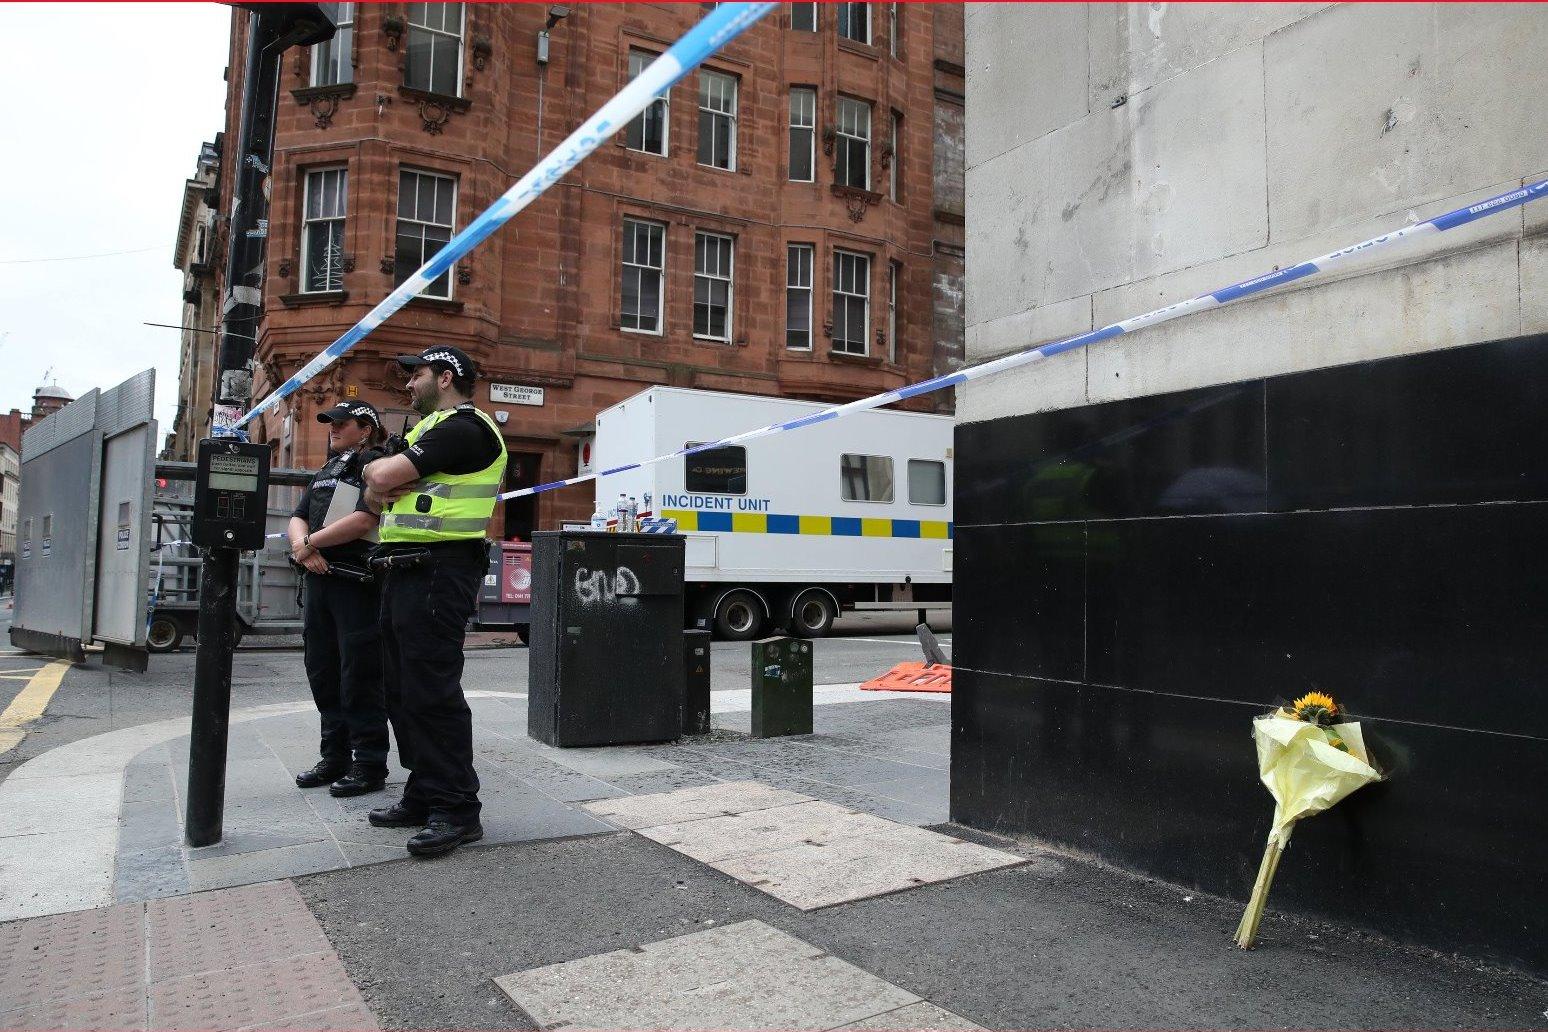 Police name Glasgow attack suspect